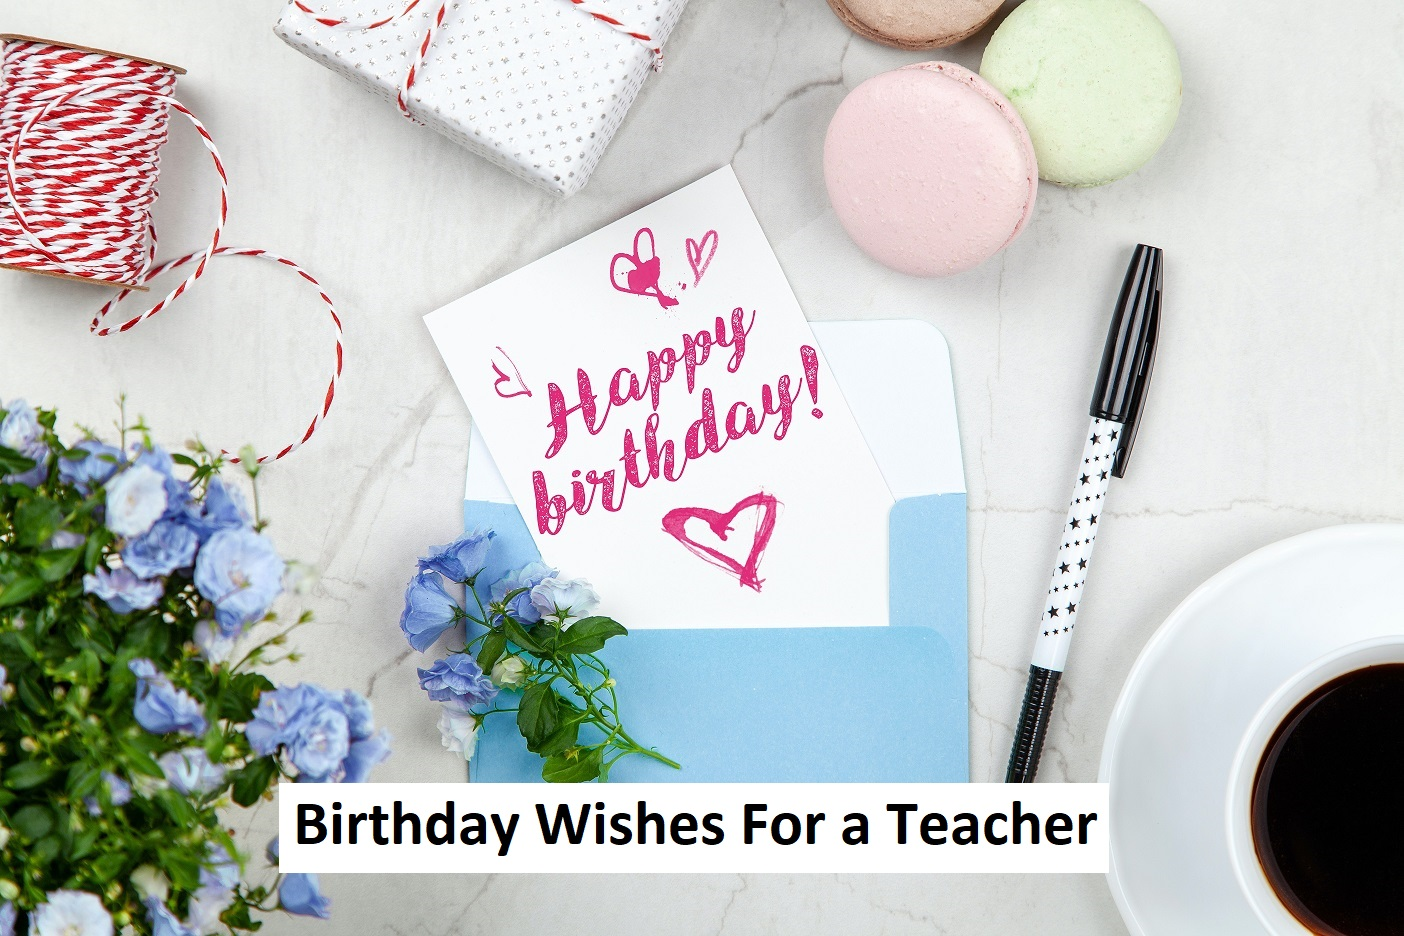 Best Birthday Wishes For a Teacher